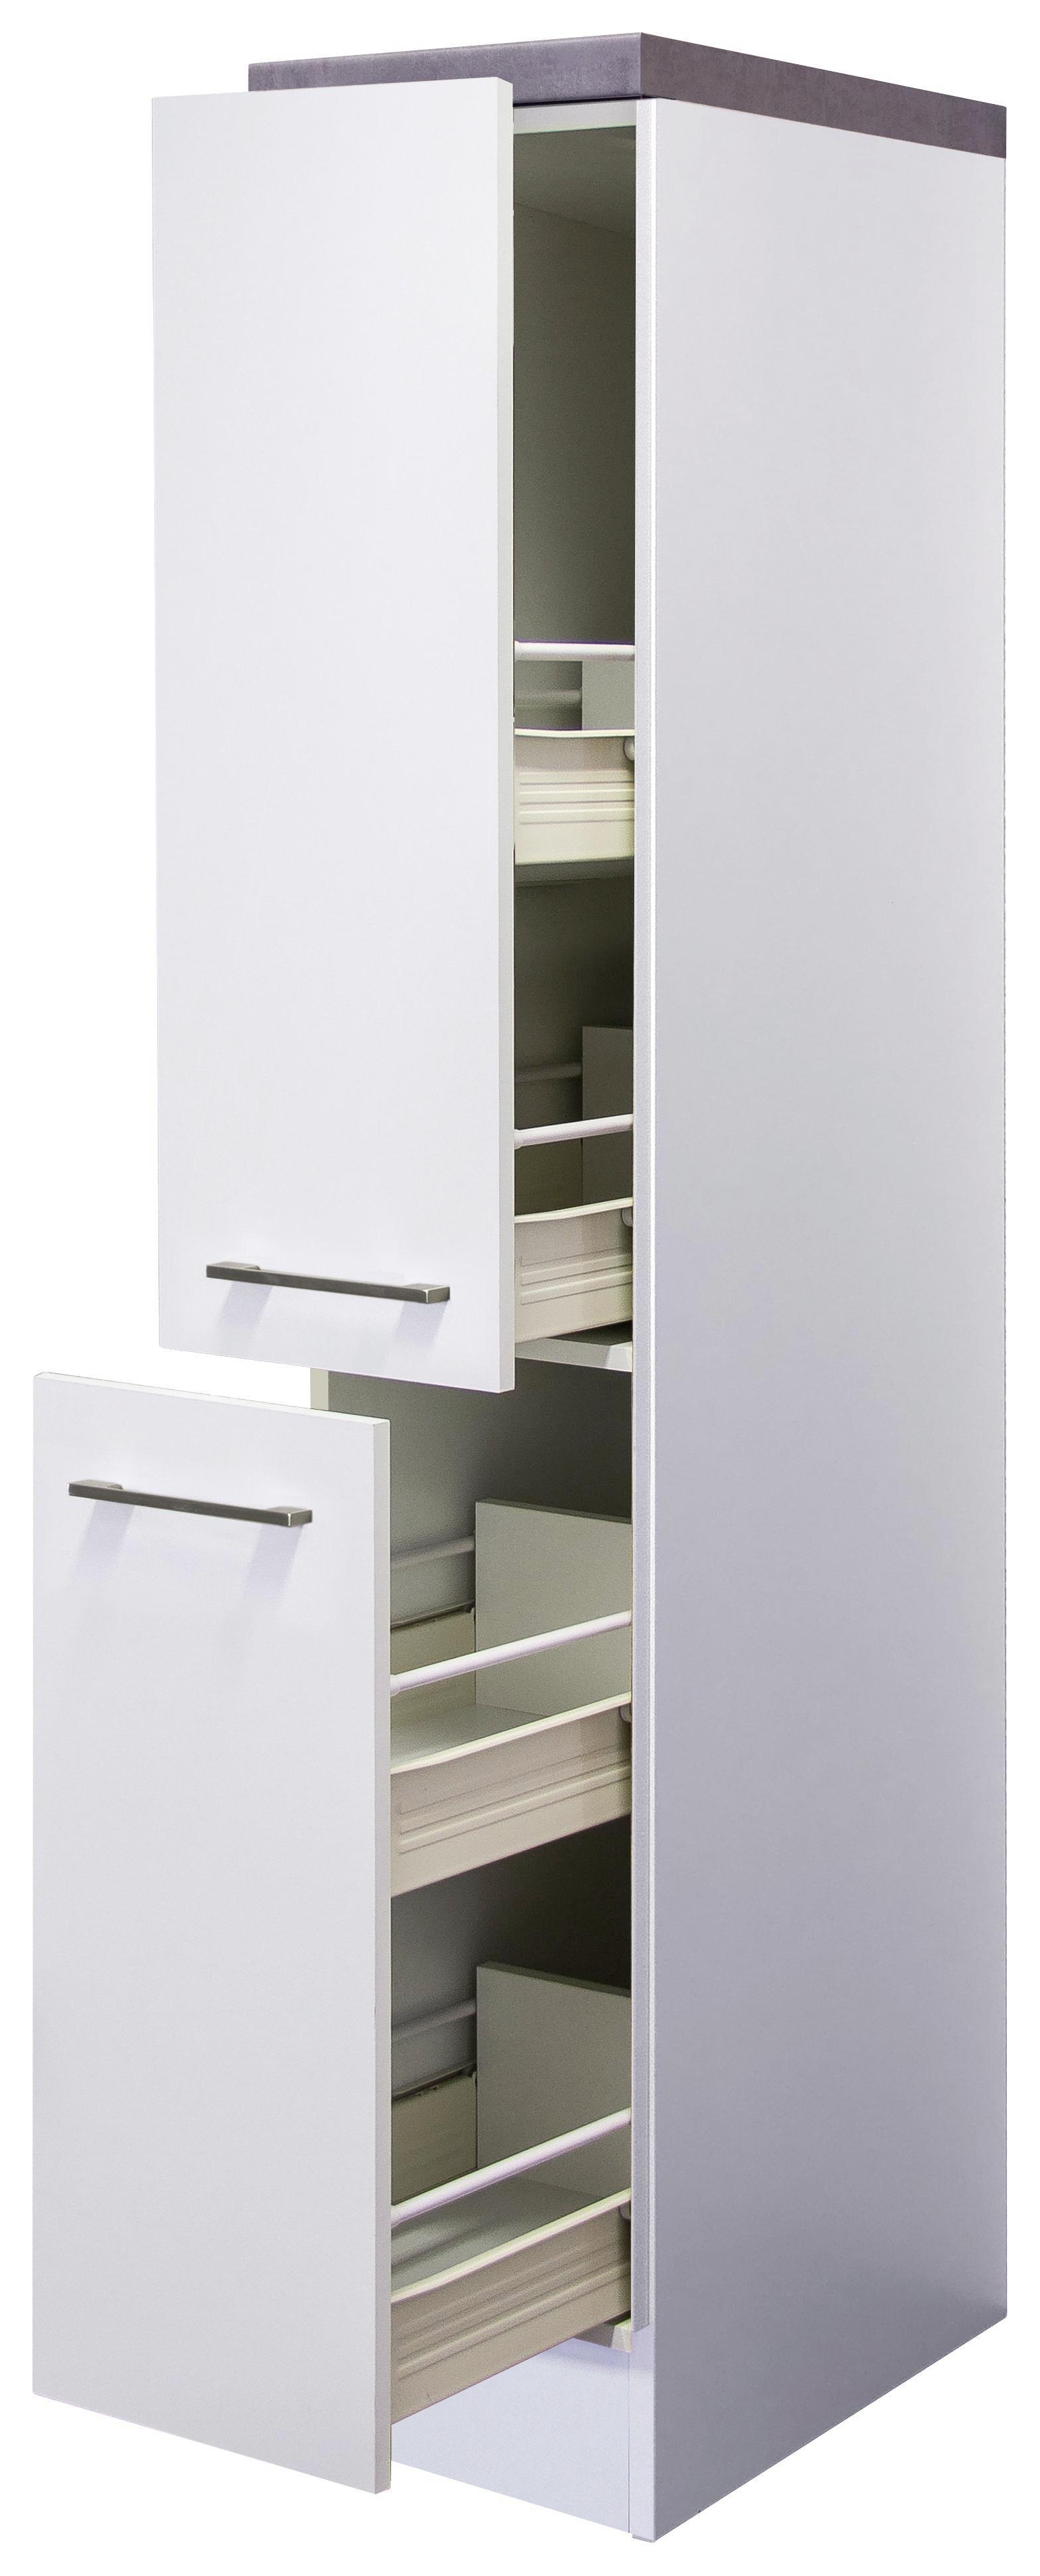 ikea küchenmöbel apothekerschrank | unterschrank 30 cm